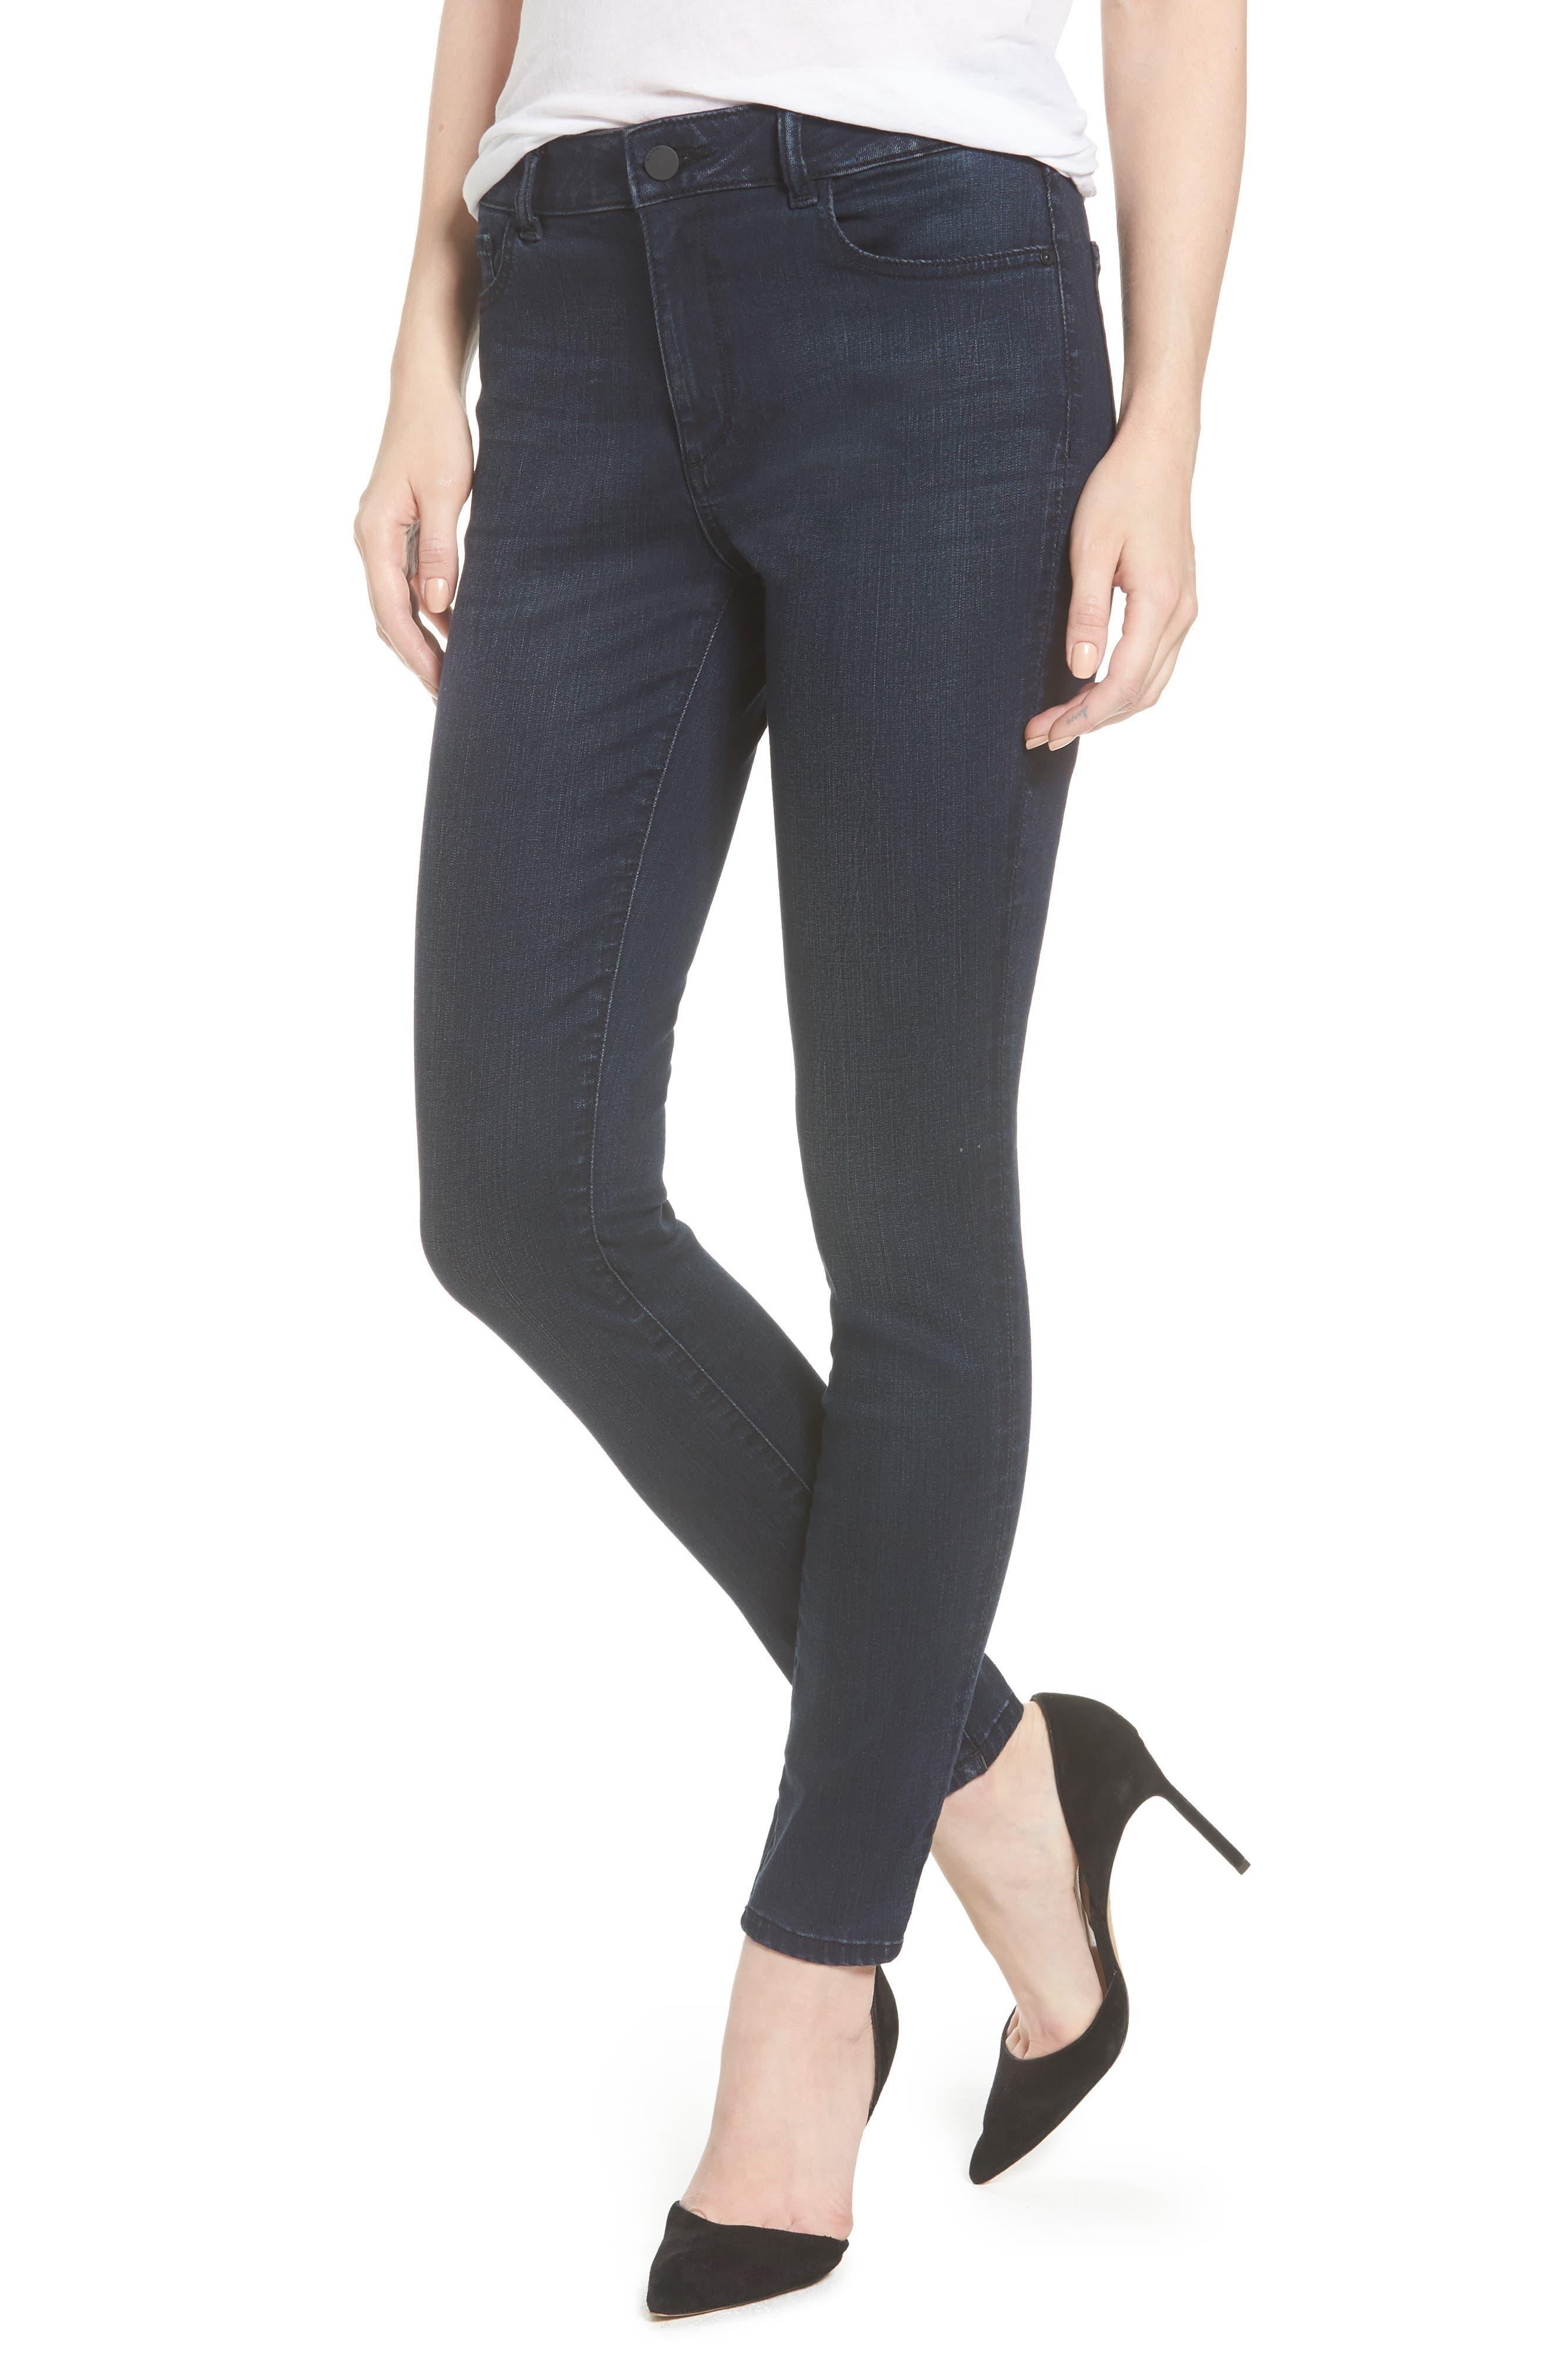 DL1961 Farrow High Waist Instaslim Skinny Jeans (Equinox)